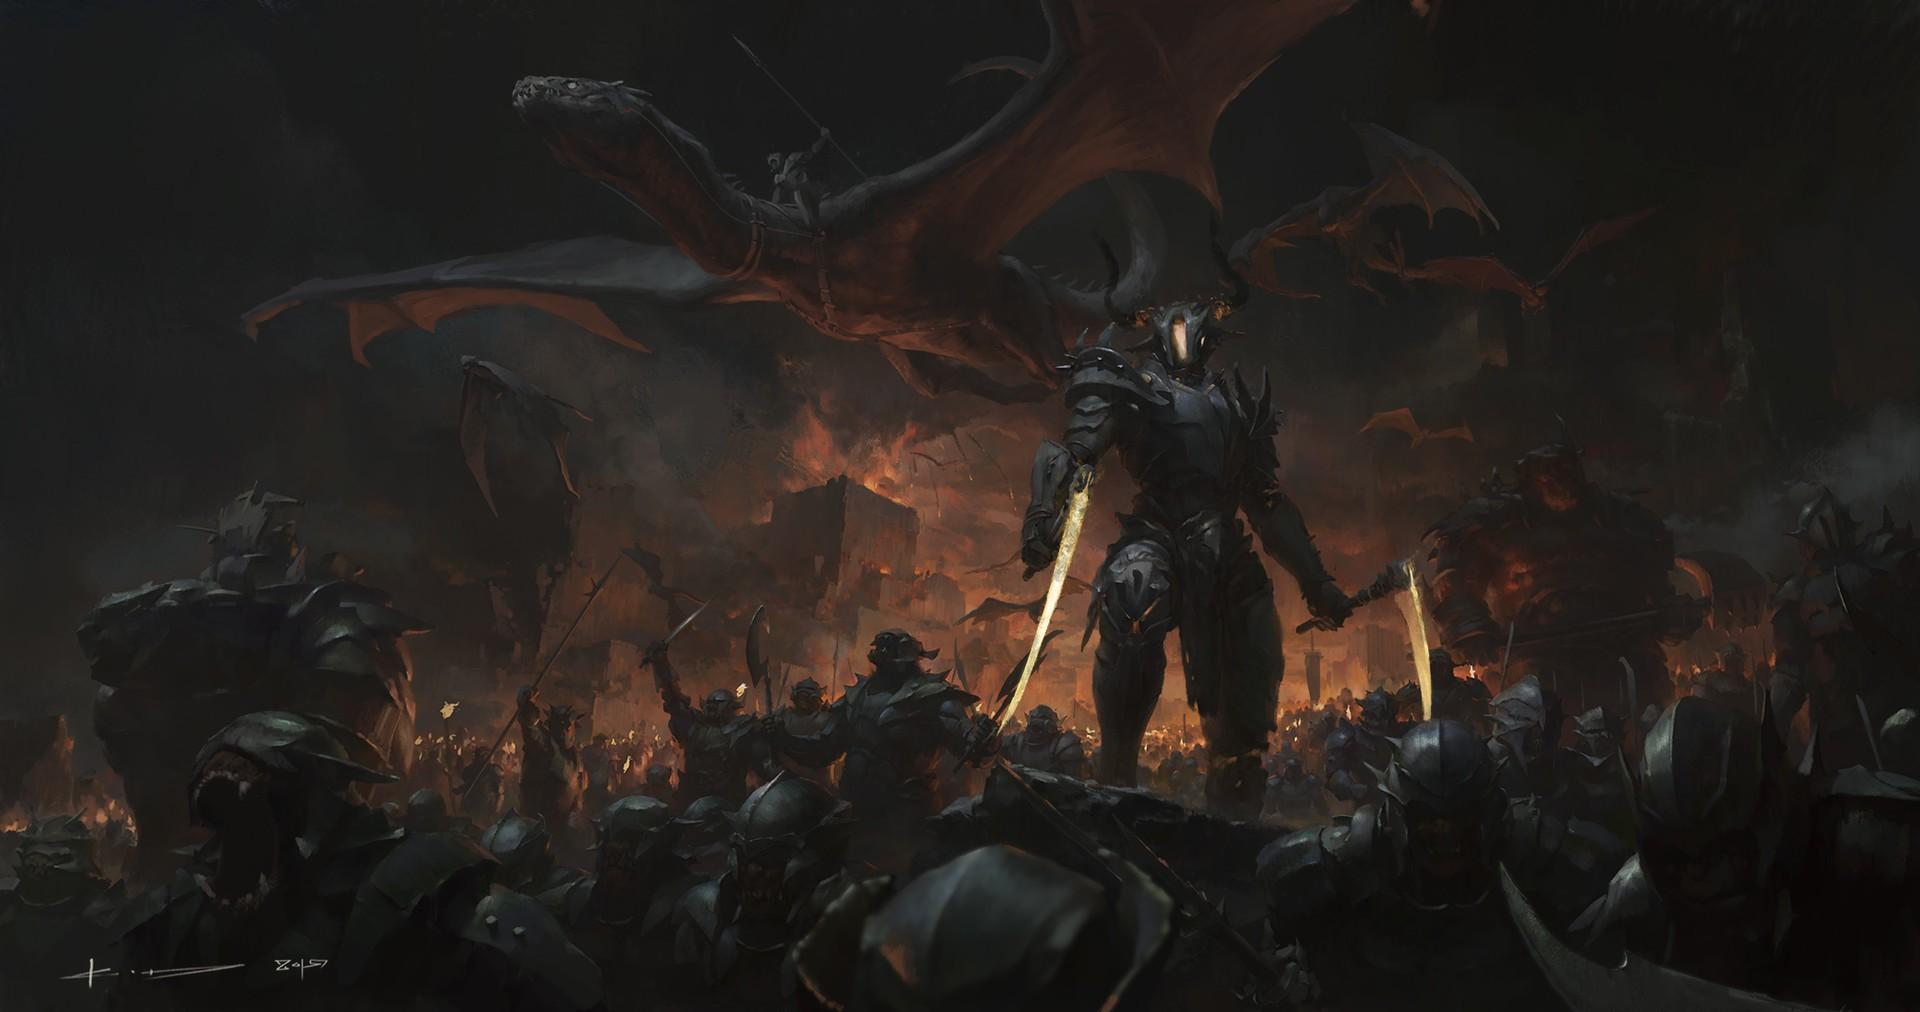 General 1920x1012 fantasy art dark fantasy battle artwork